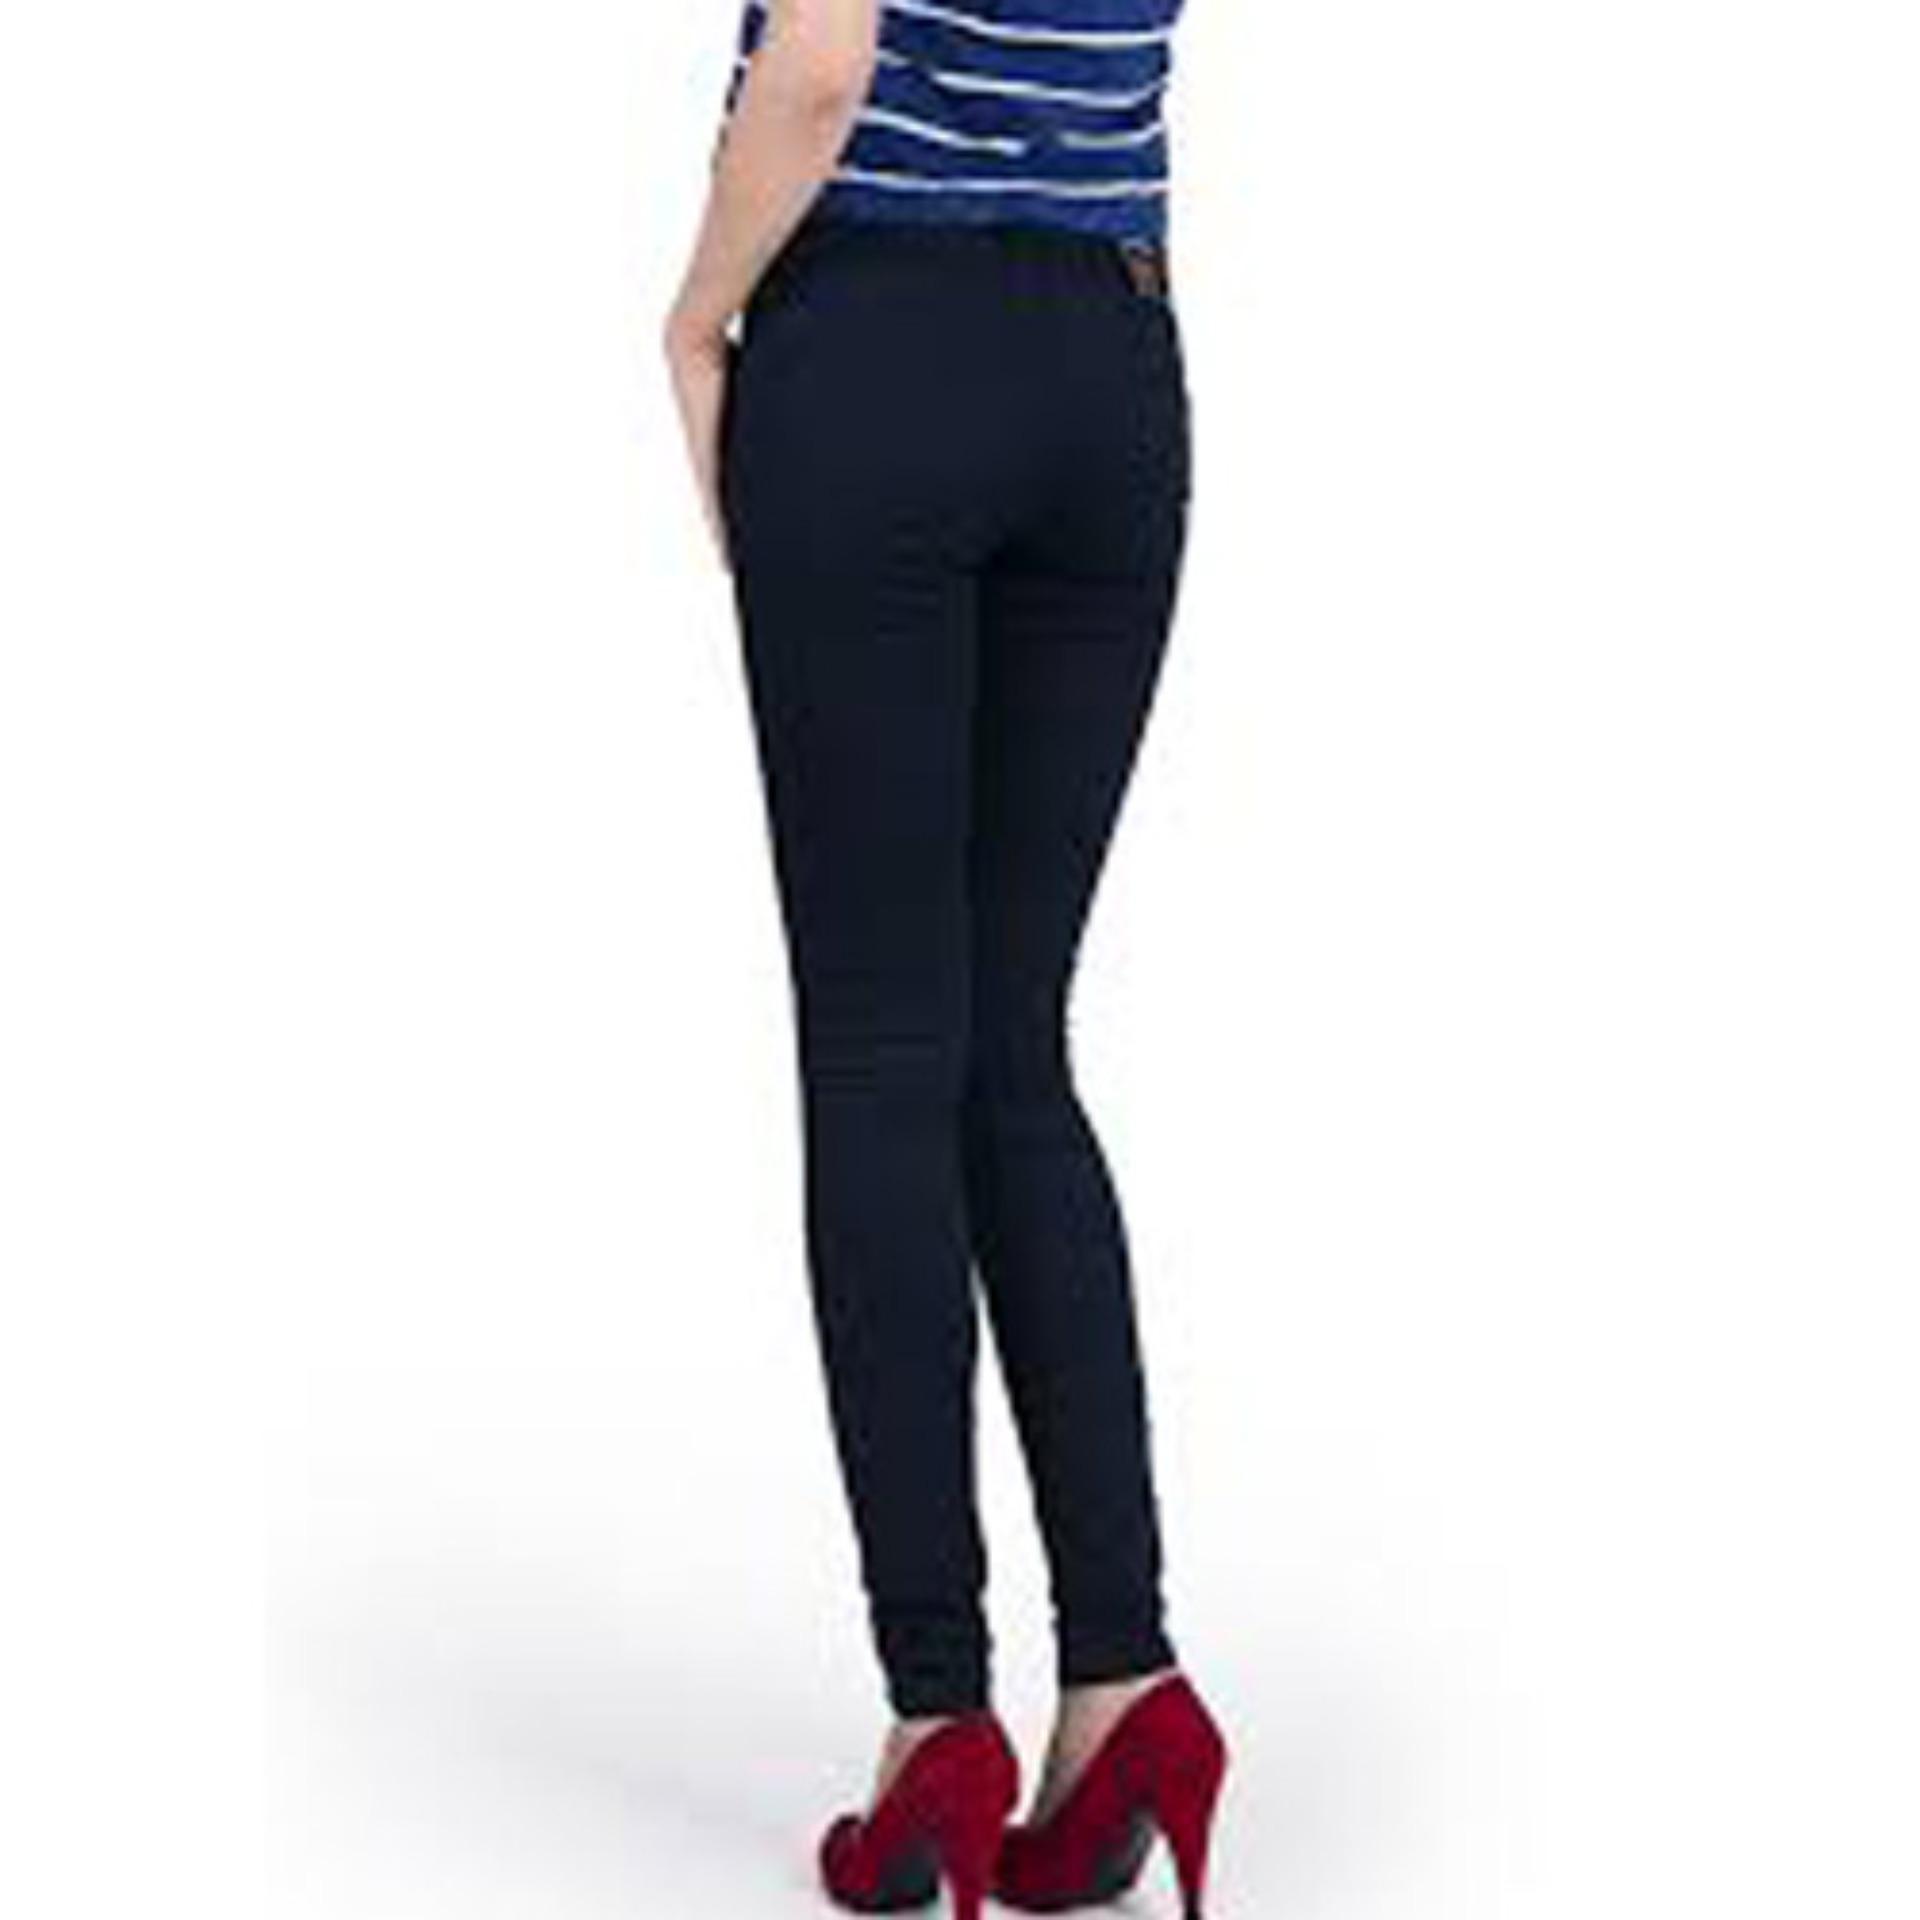 Quần Kaki Nữ Skinny Thời Trang-Xanh đen kk02